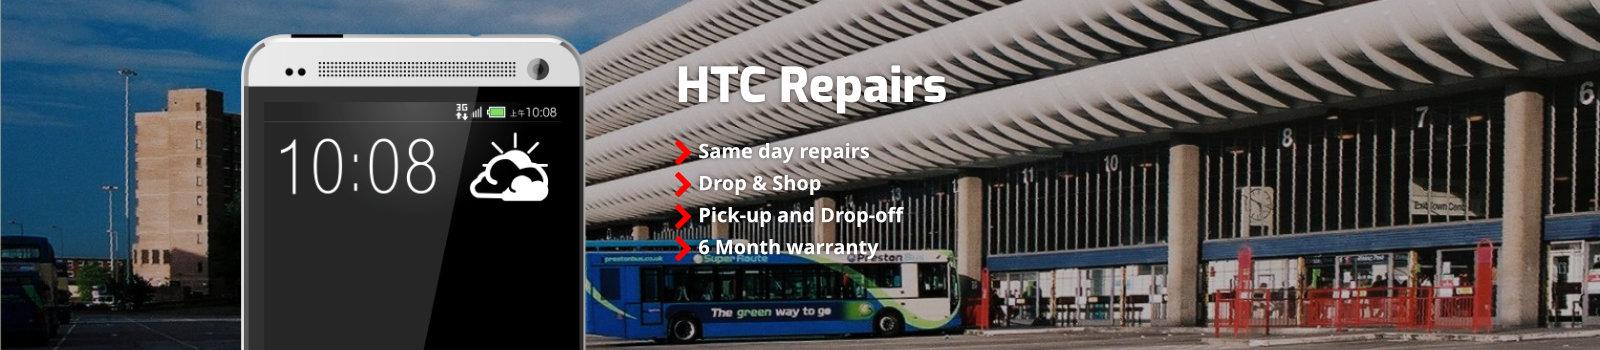 Htc Repairs Preston